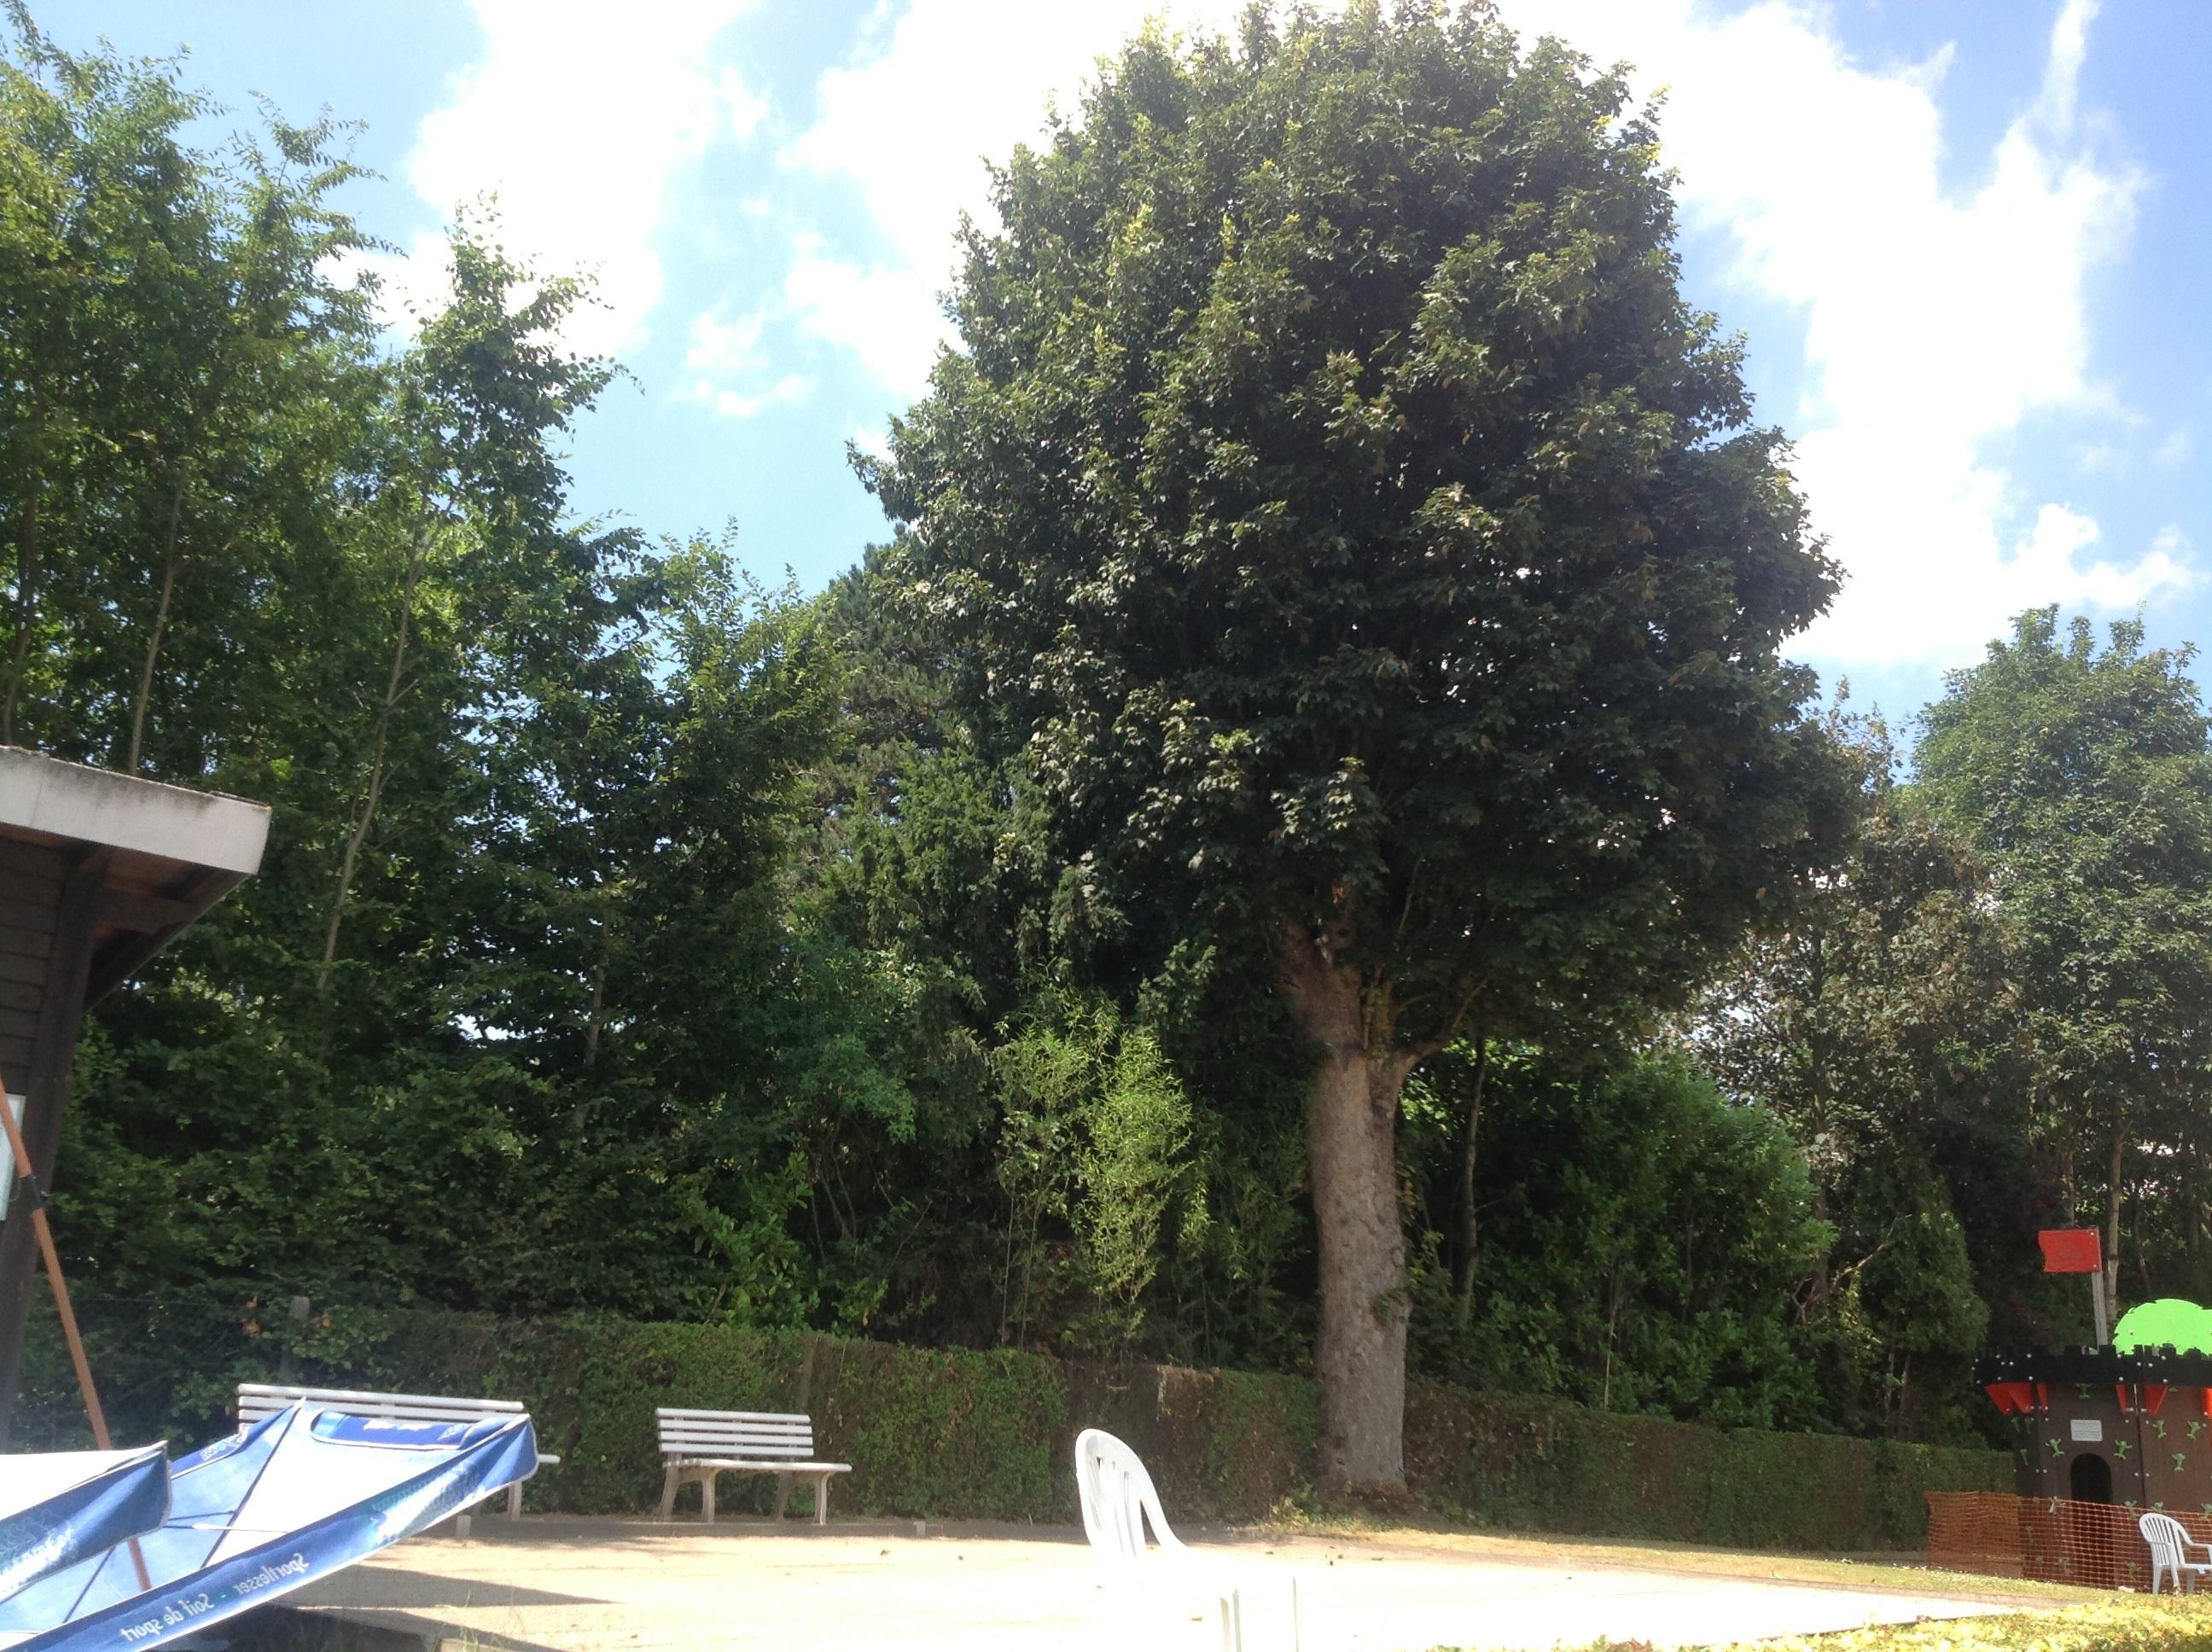 Acer pseudoplatanus 'Purpurascens' – Berchem-Sainte-Agathe, Avenue de la Basilique, 14 –  25 Juillet 2013